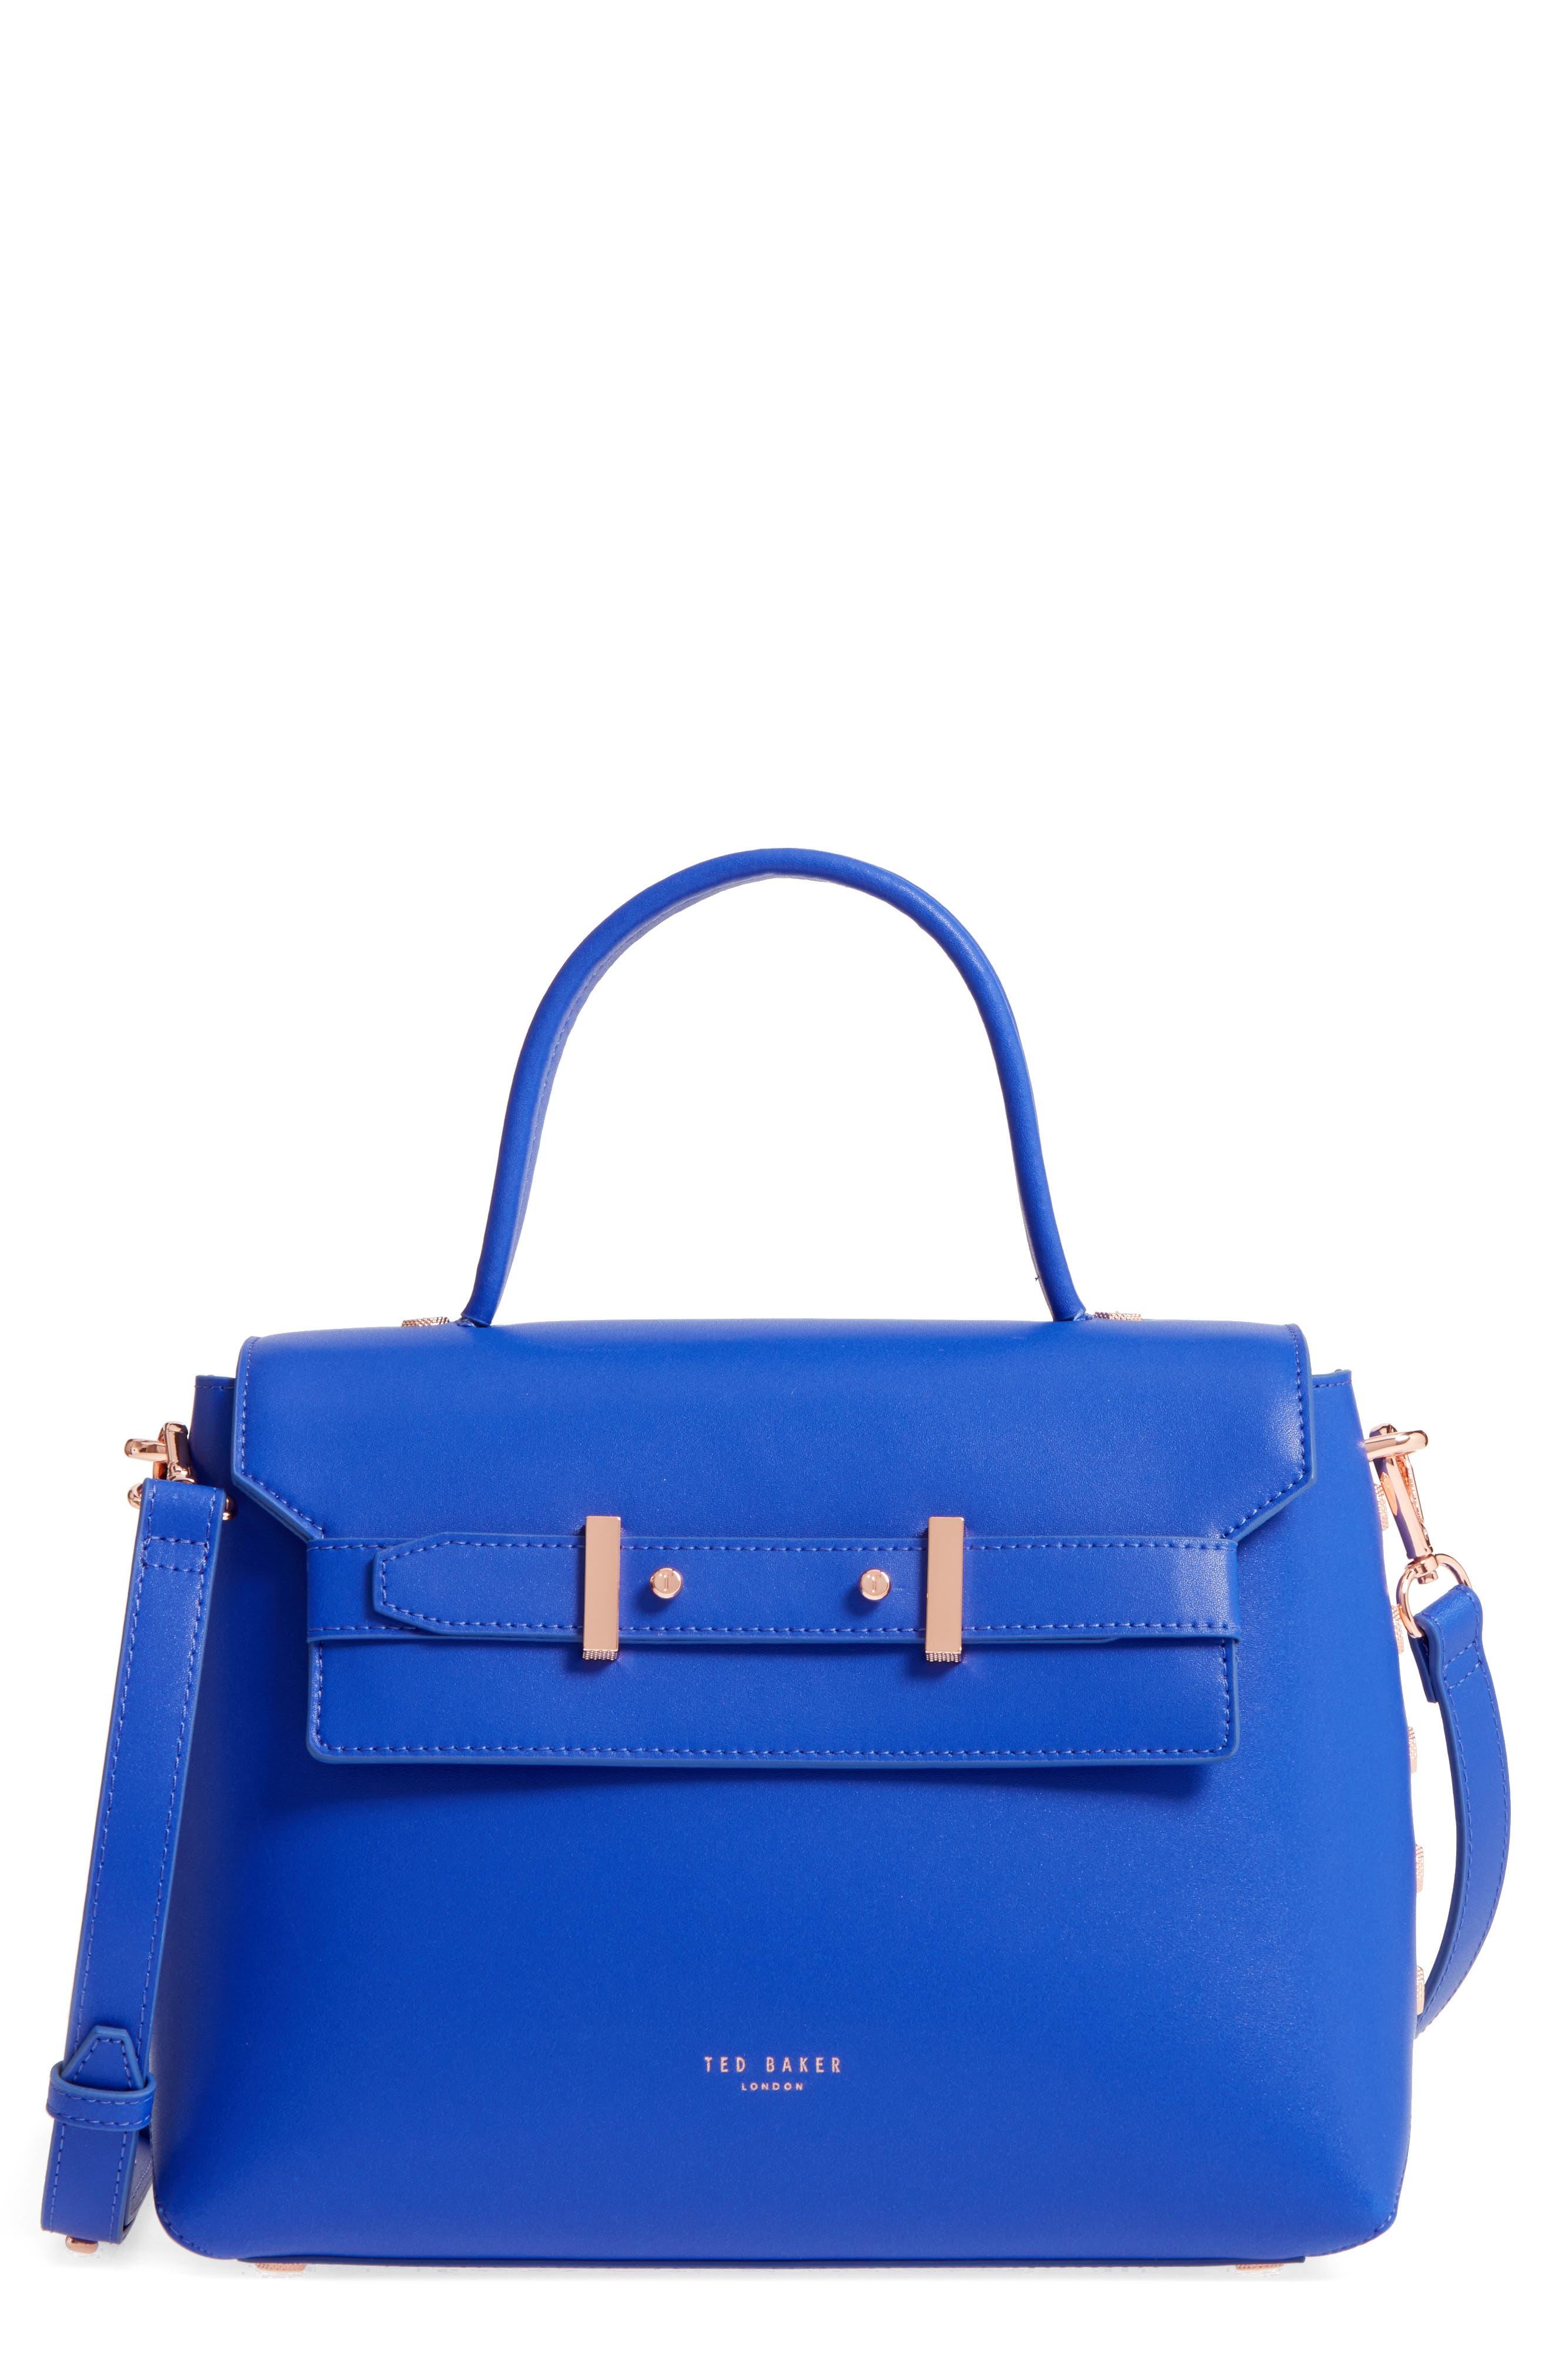 Alternate Image 1 Selected - Ted Baker London Taymar - Studded Edge Lady Bag Leather Top Handle Satchel